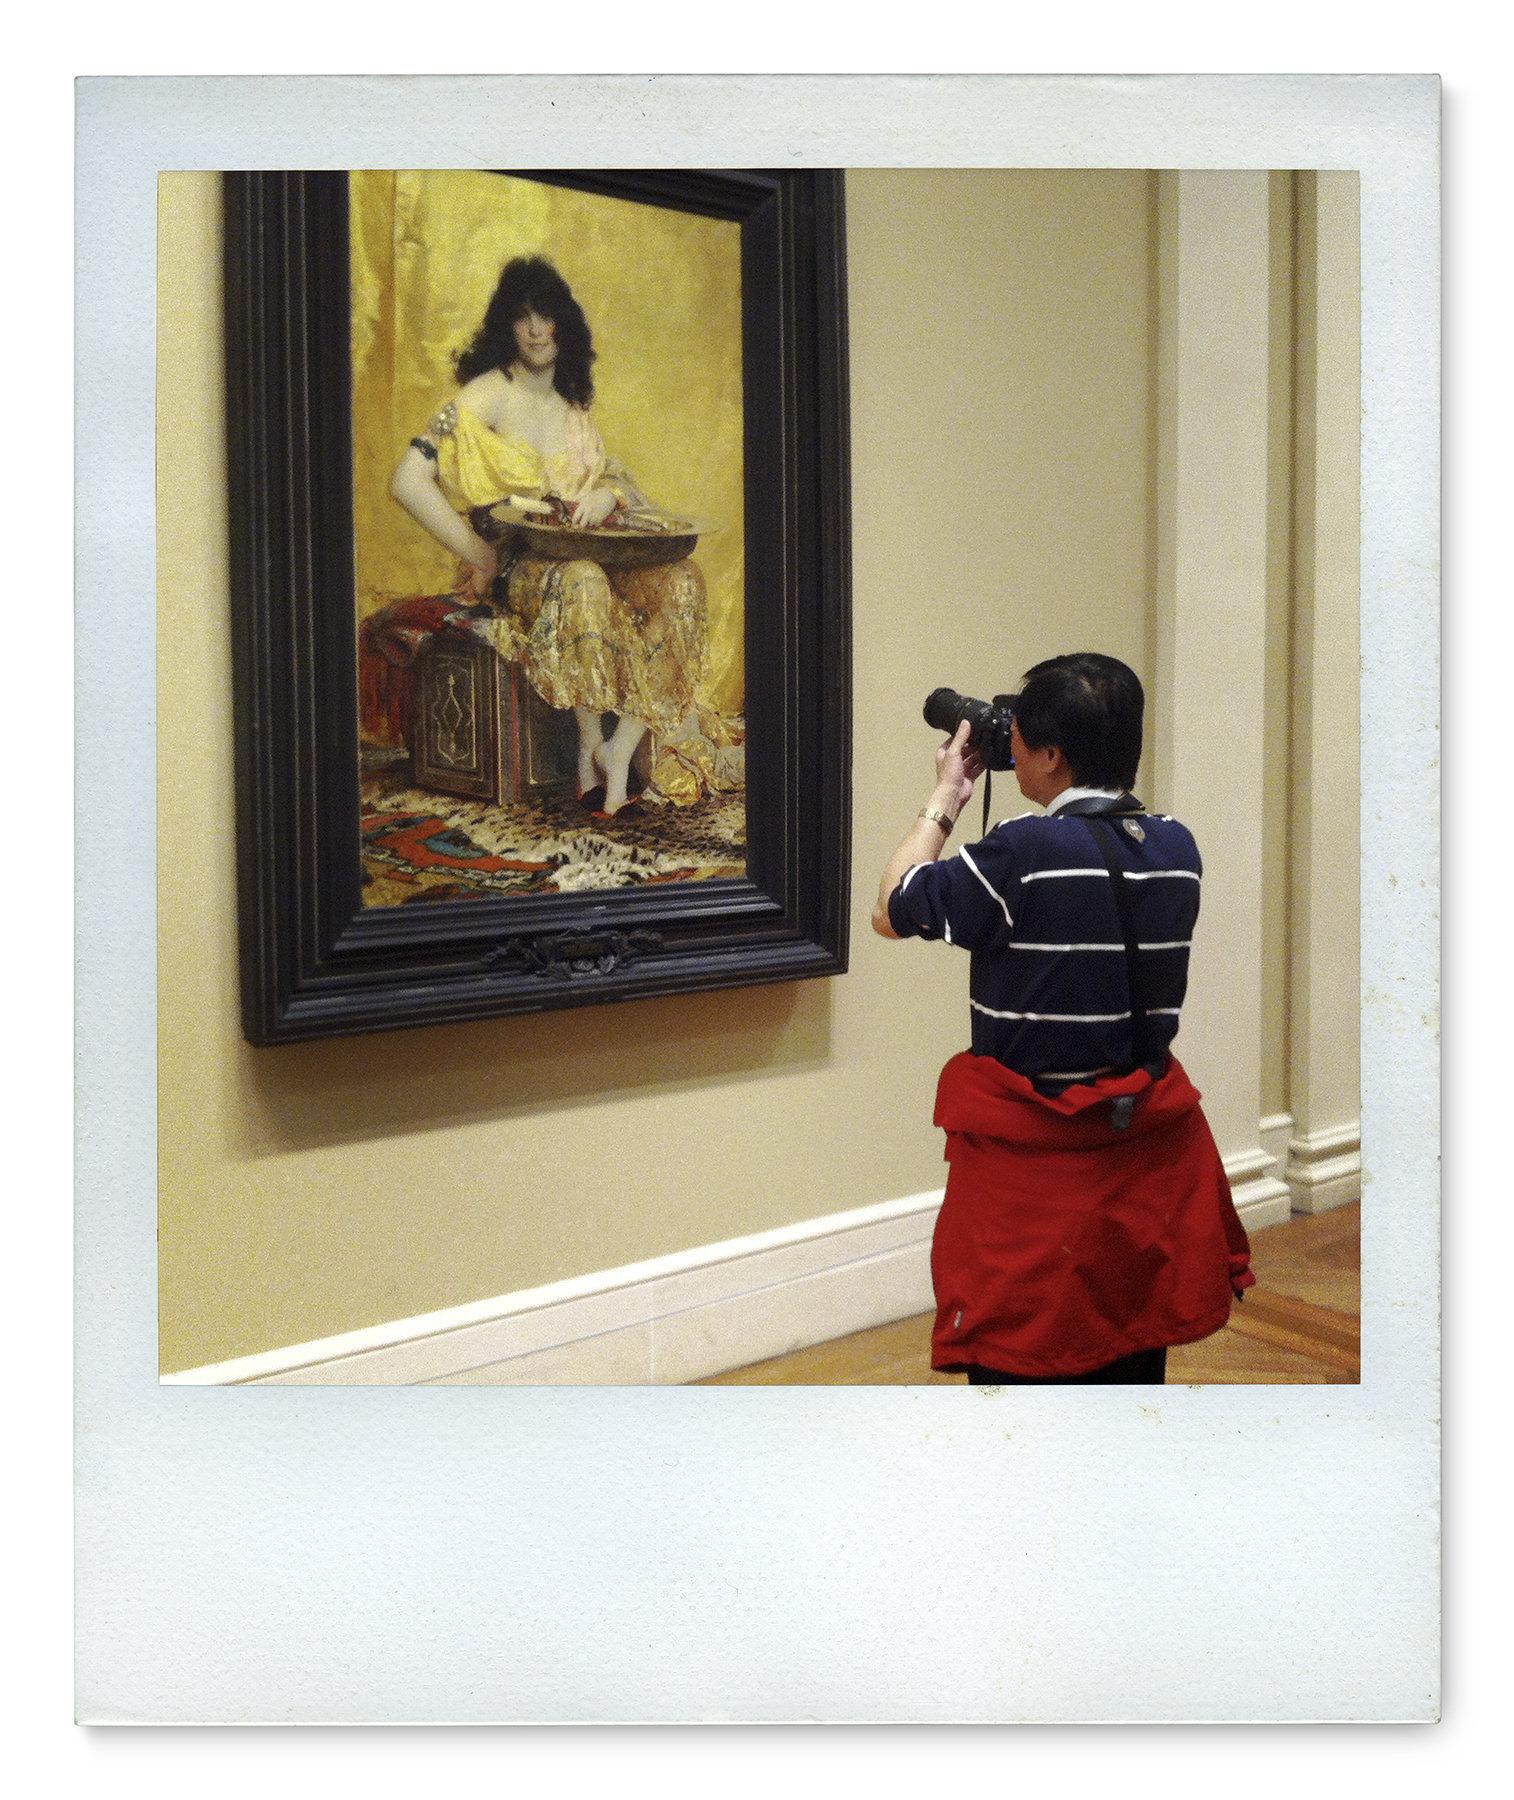 018_Polaroid SX70_IMG_5882.jpg